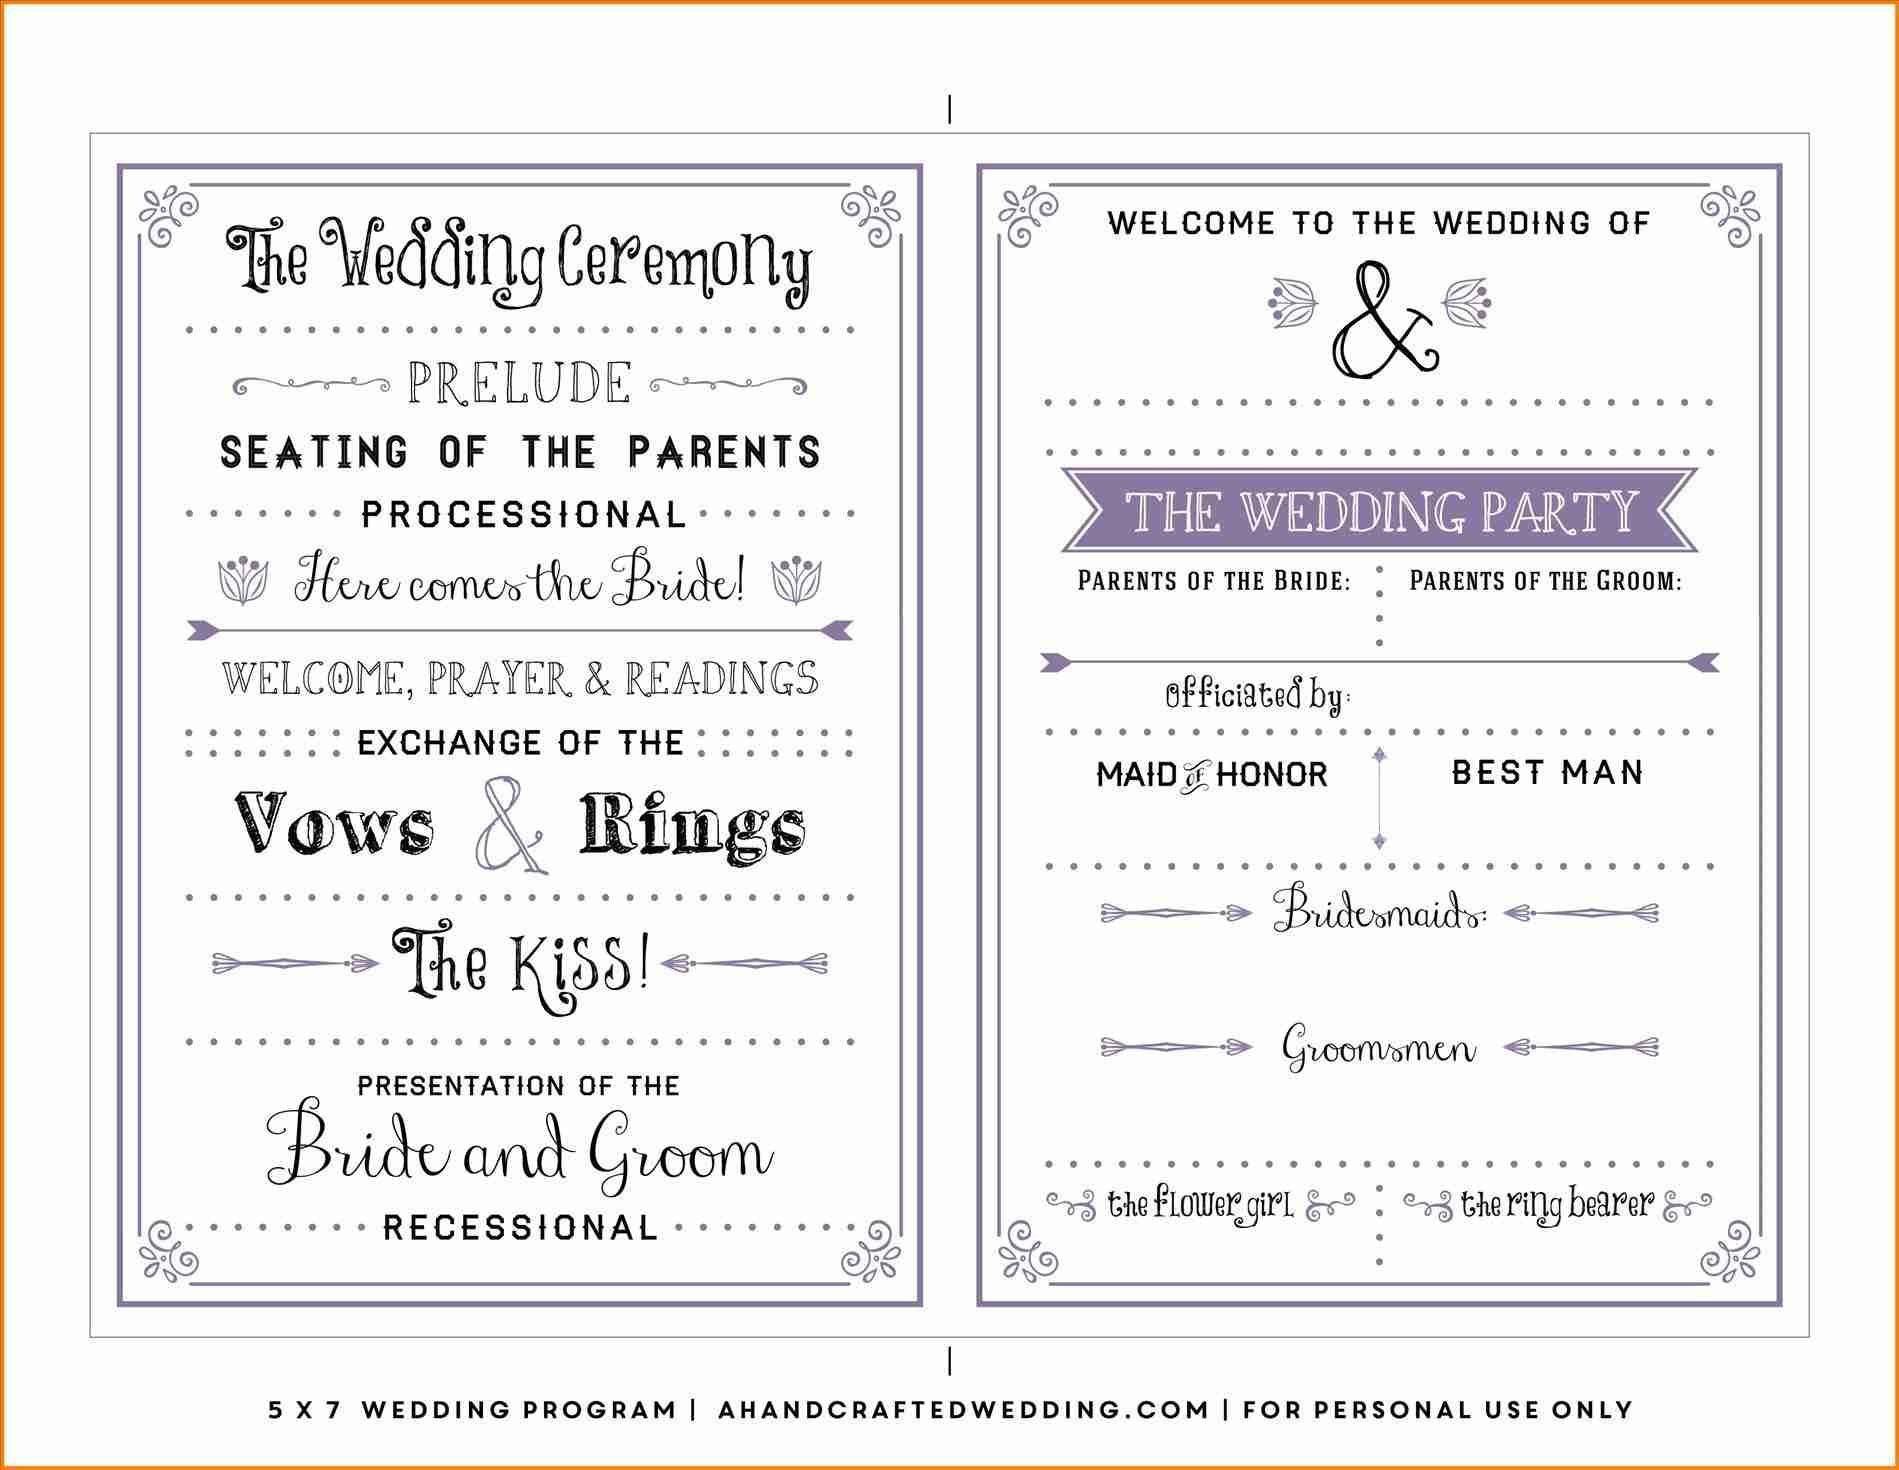 000 Staggering Wedding Program Template Word Design  Catholic Mas Sample Wording Idea Example SimpleFull